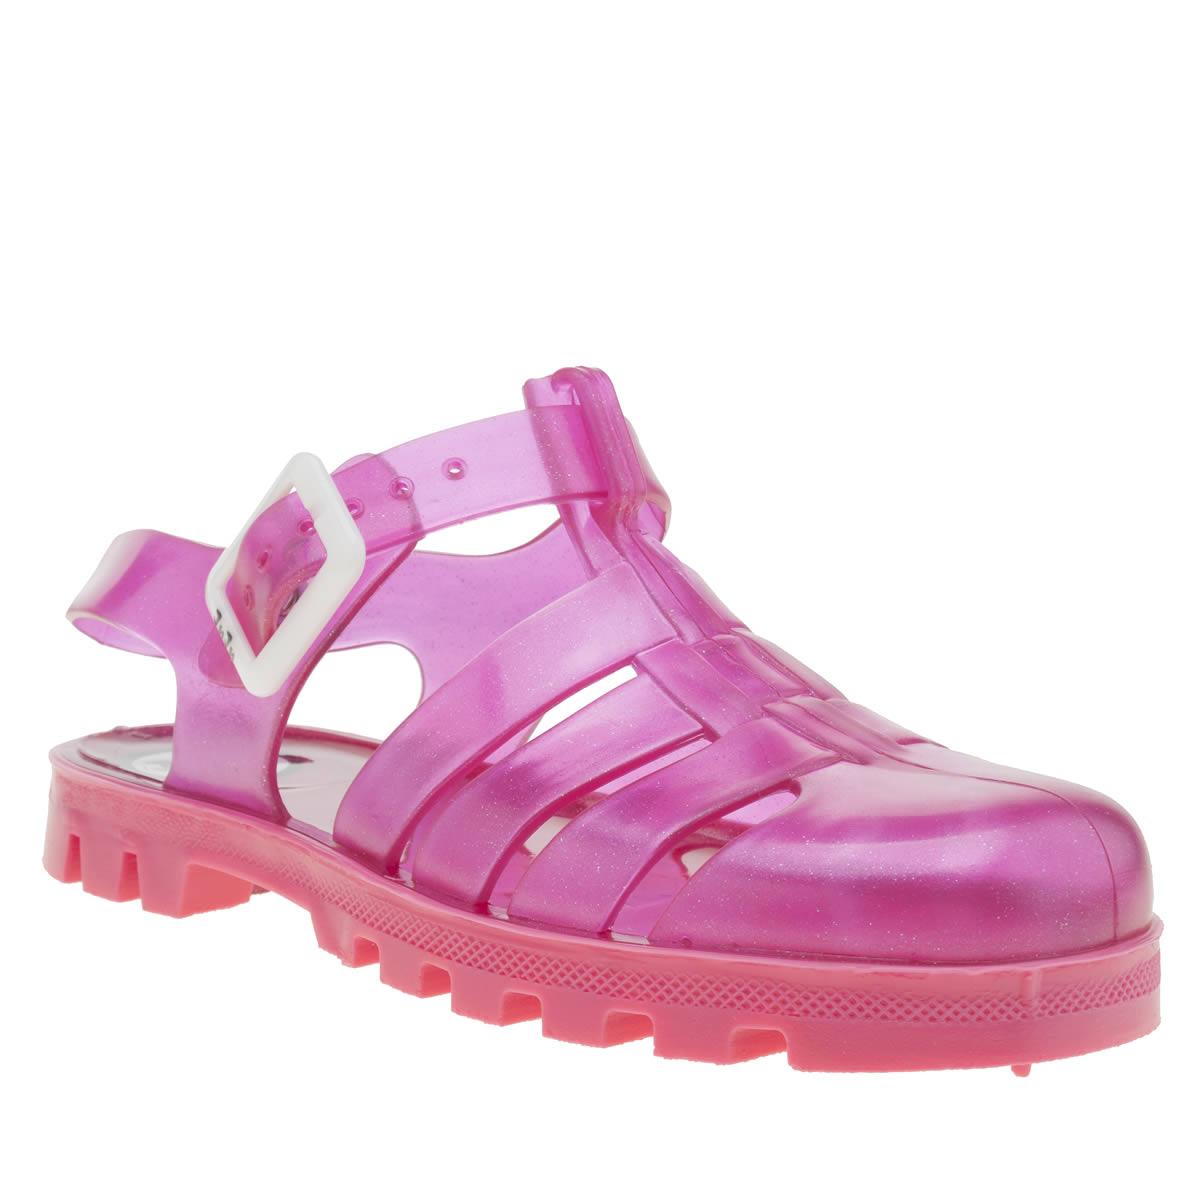 juju jellies Juju Jellies Pink Maxi Girls Junior